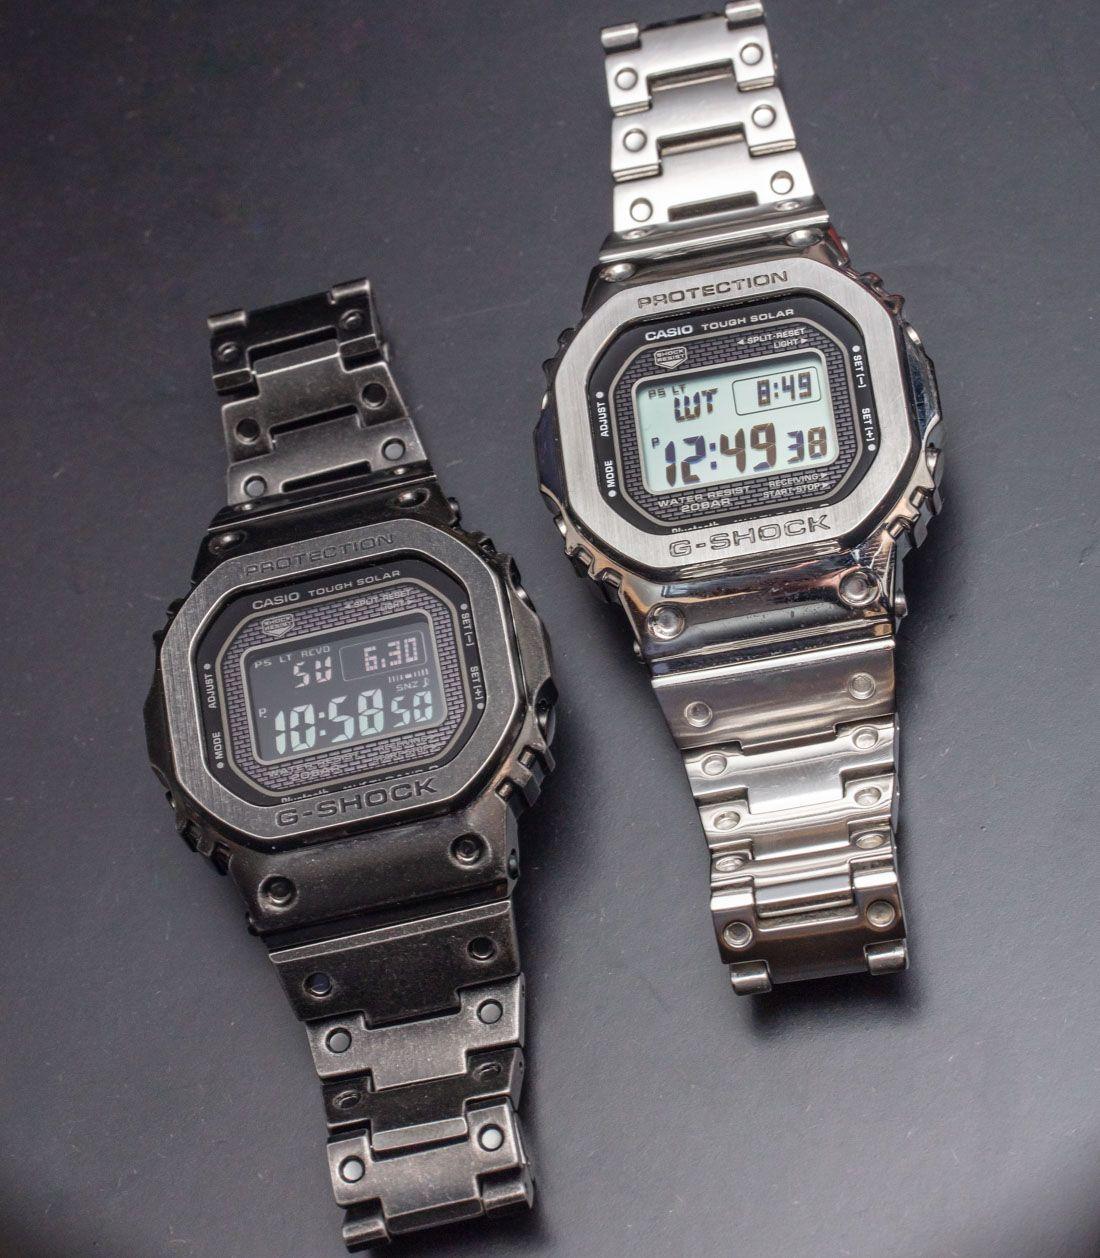 Casio G Shock GMW B5000V Aged IP Full Metal Watch Hands On